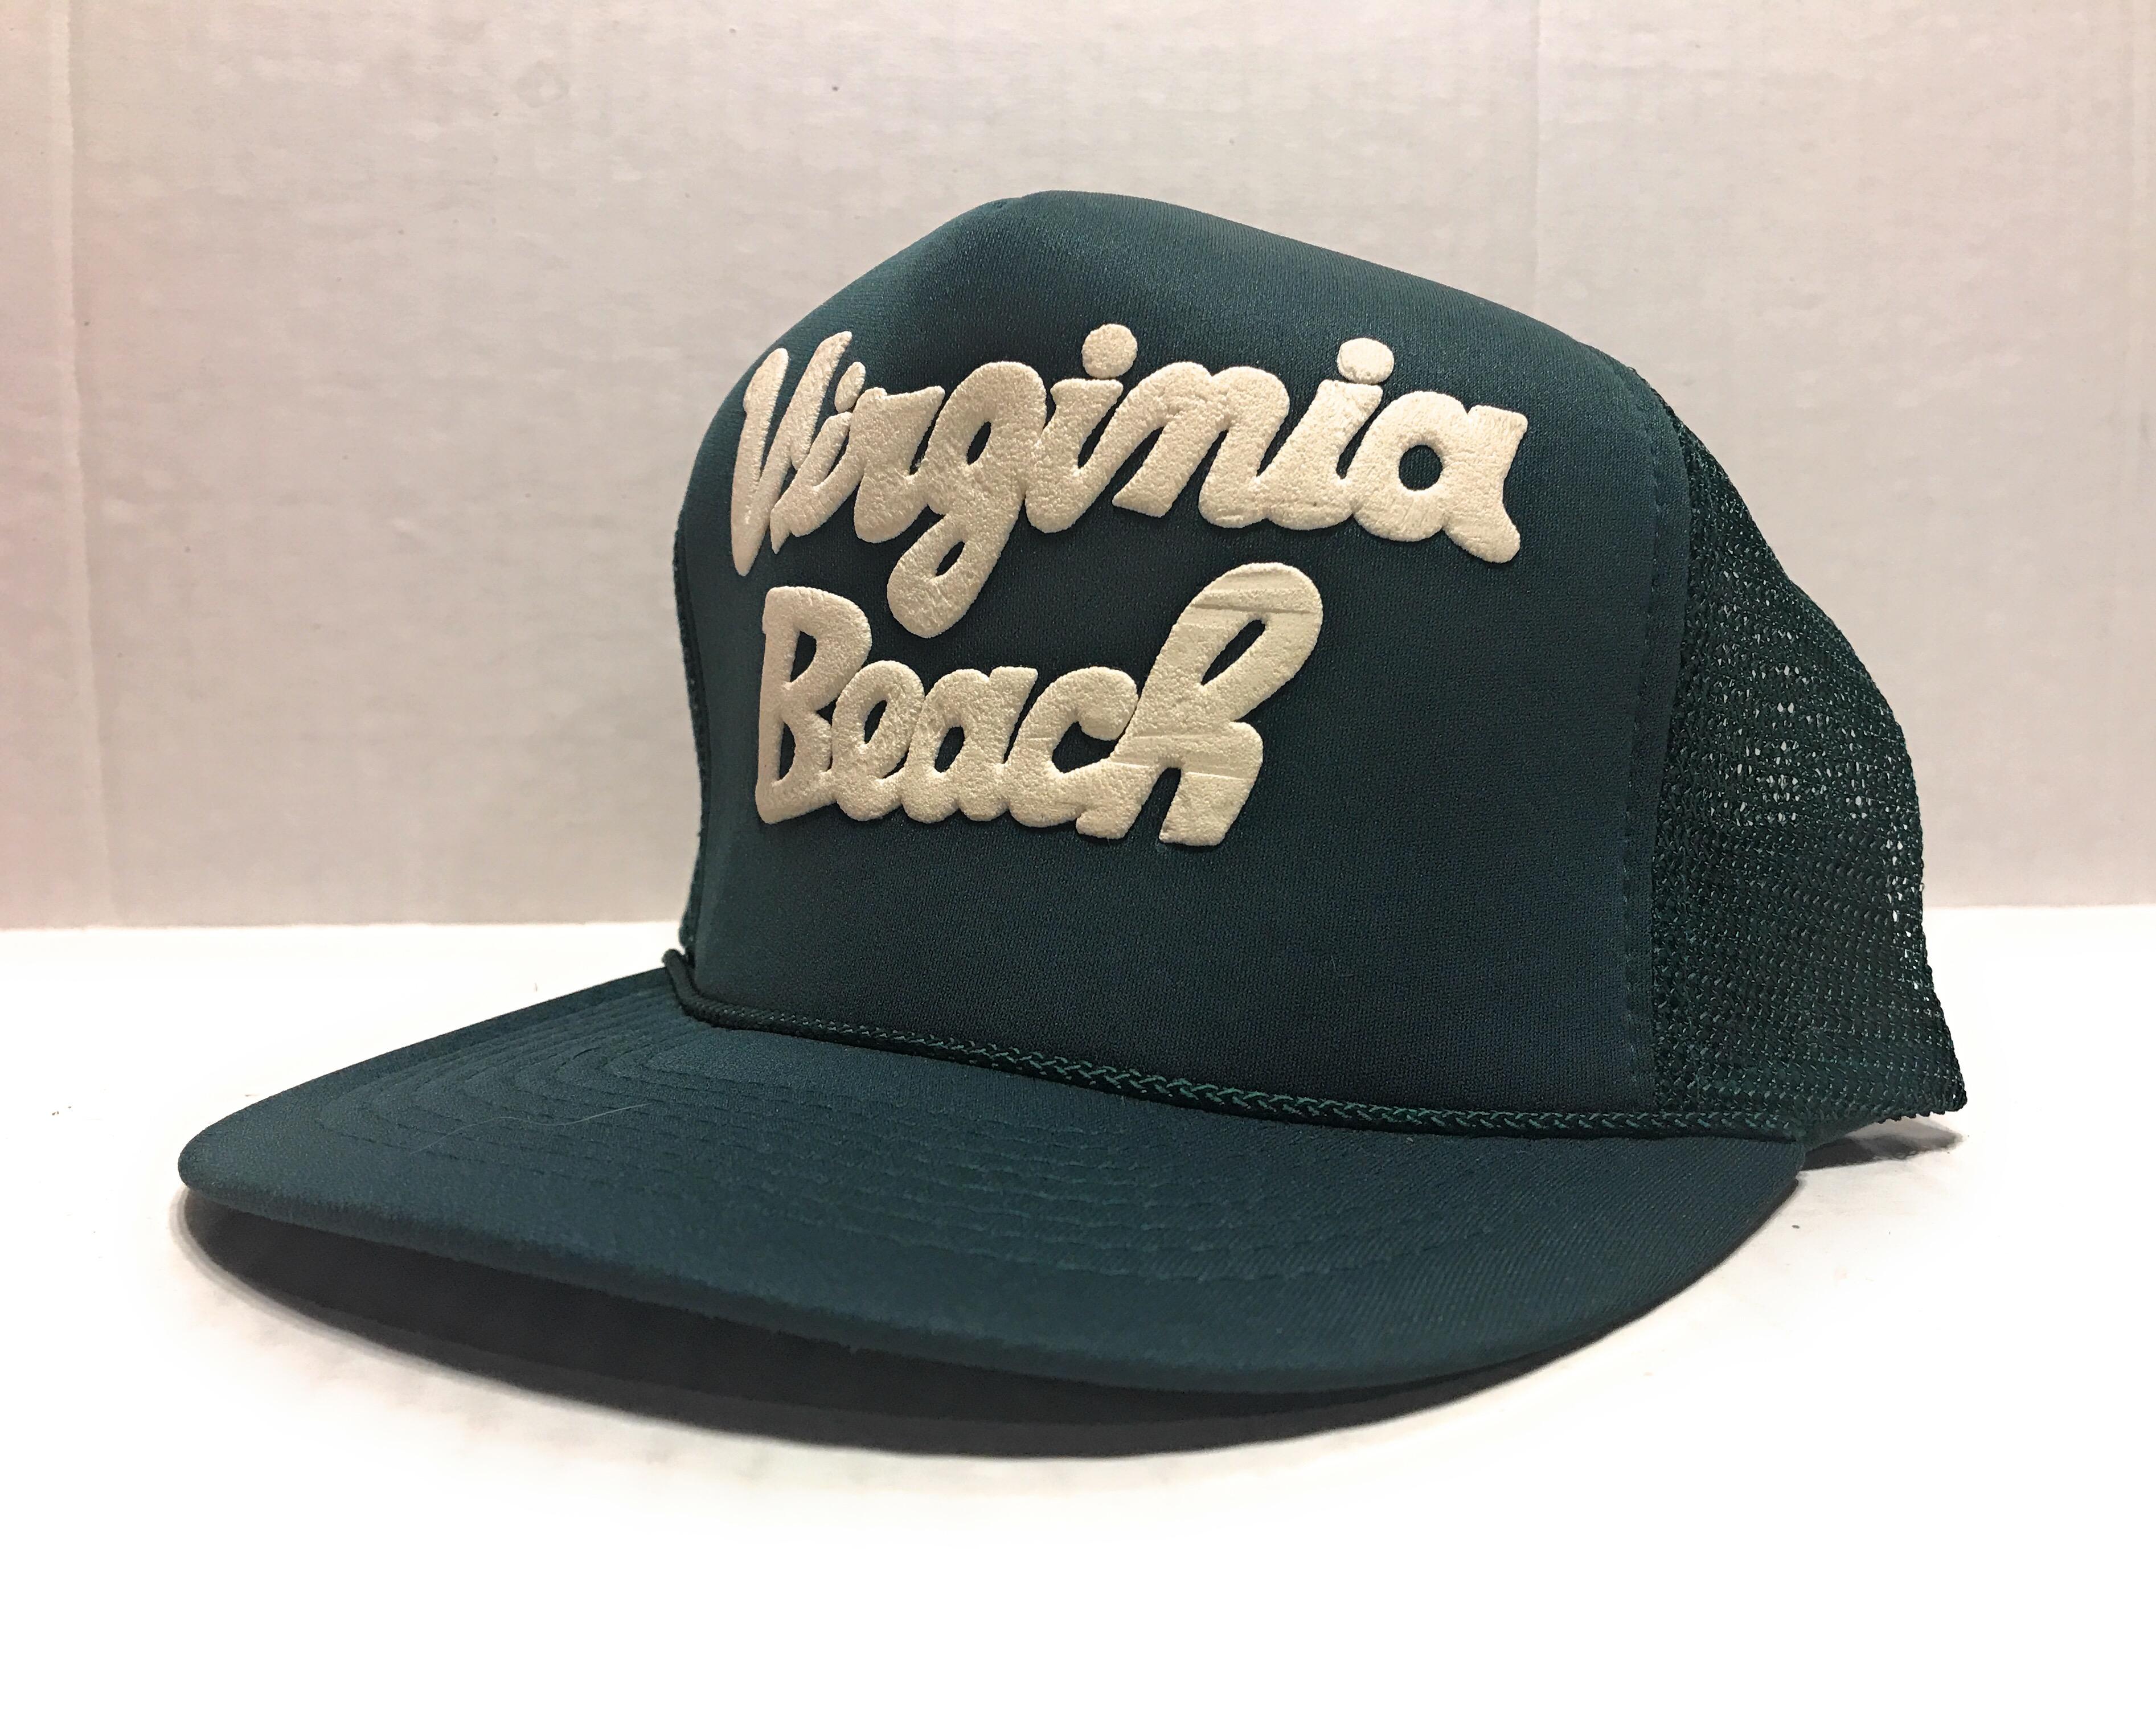 Virginia Beach Pharrell Williams Nerd